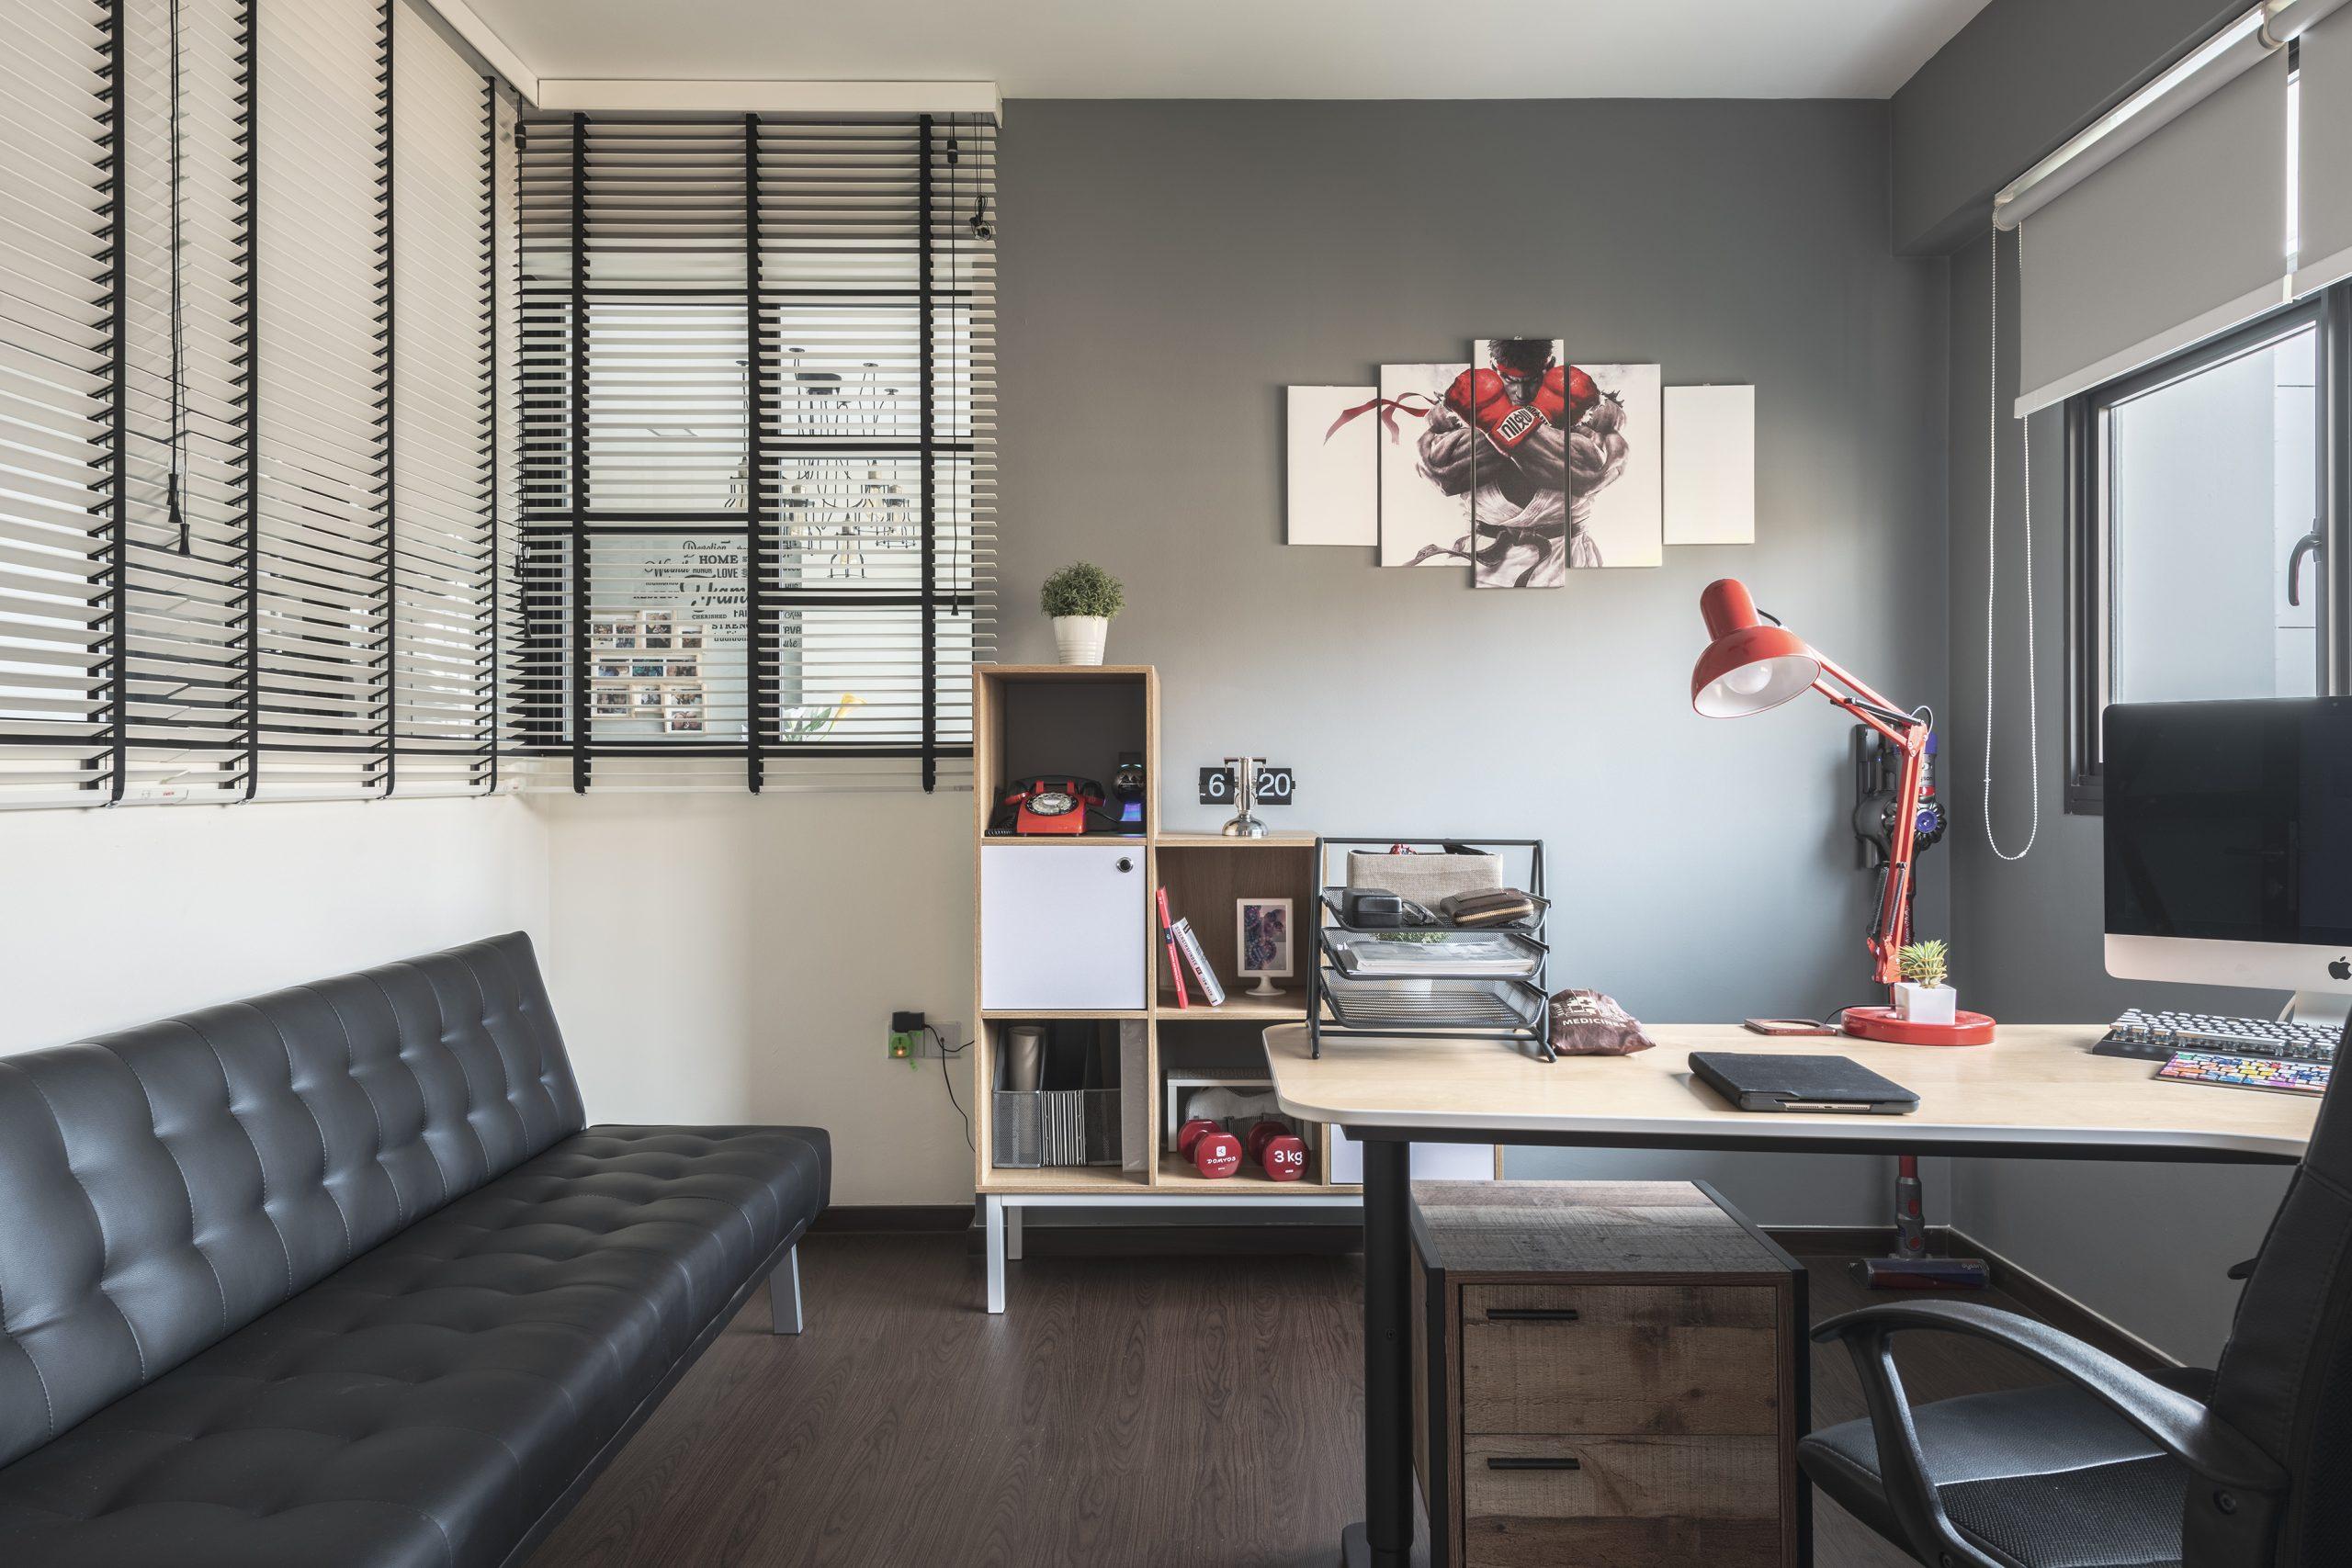 7 Spare Bedroom Makeover Ideas: Home Cinema, House Gym, and More!